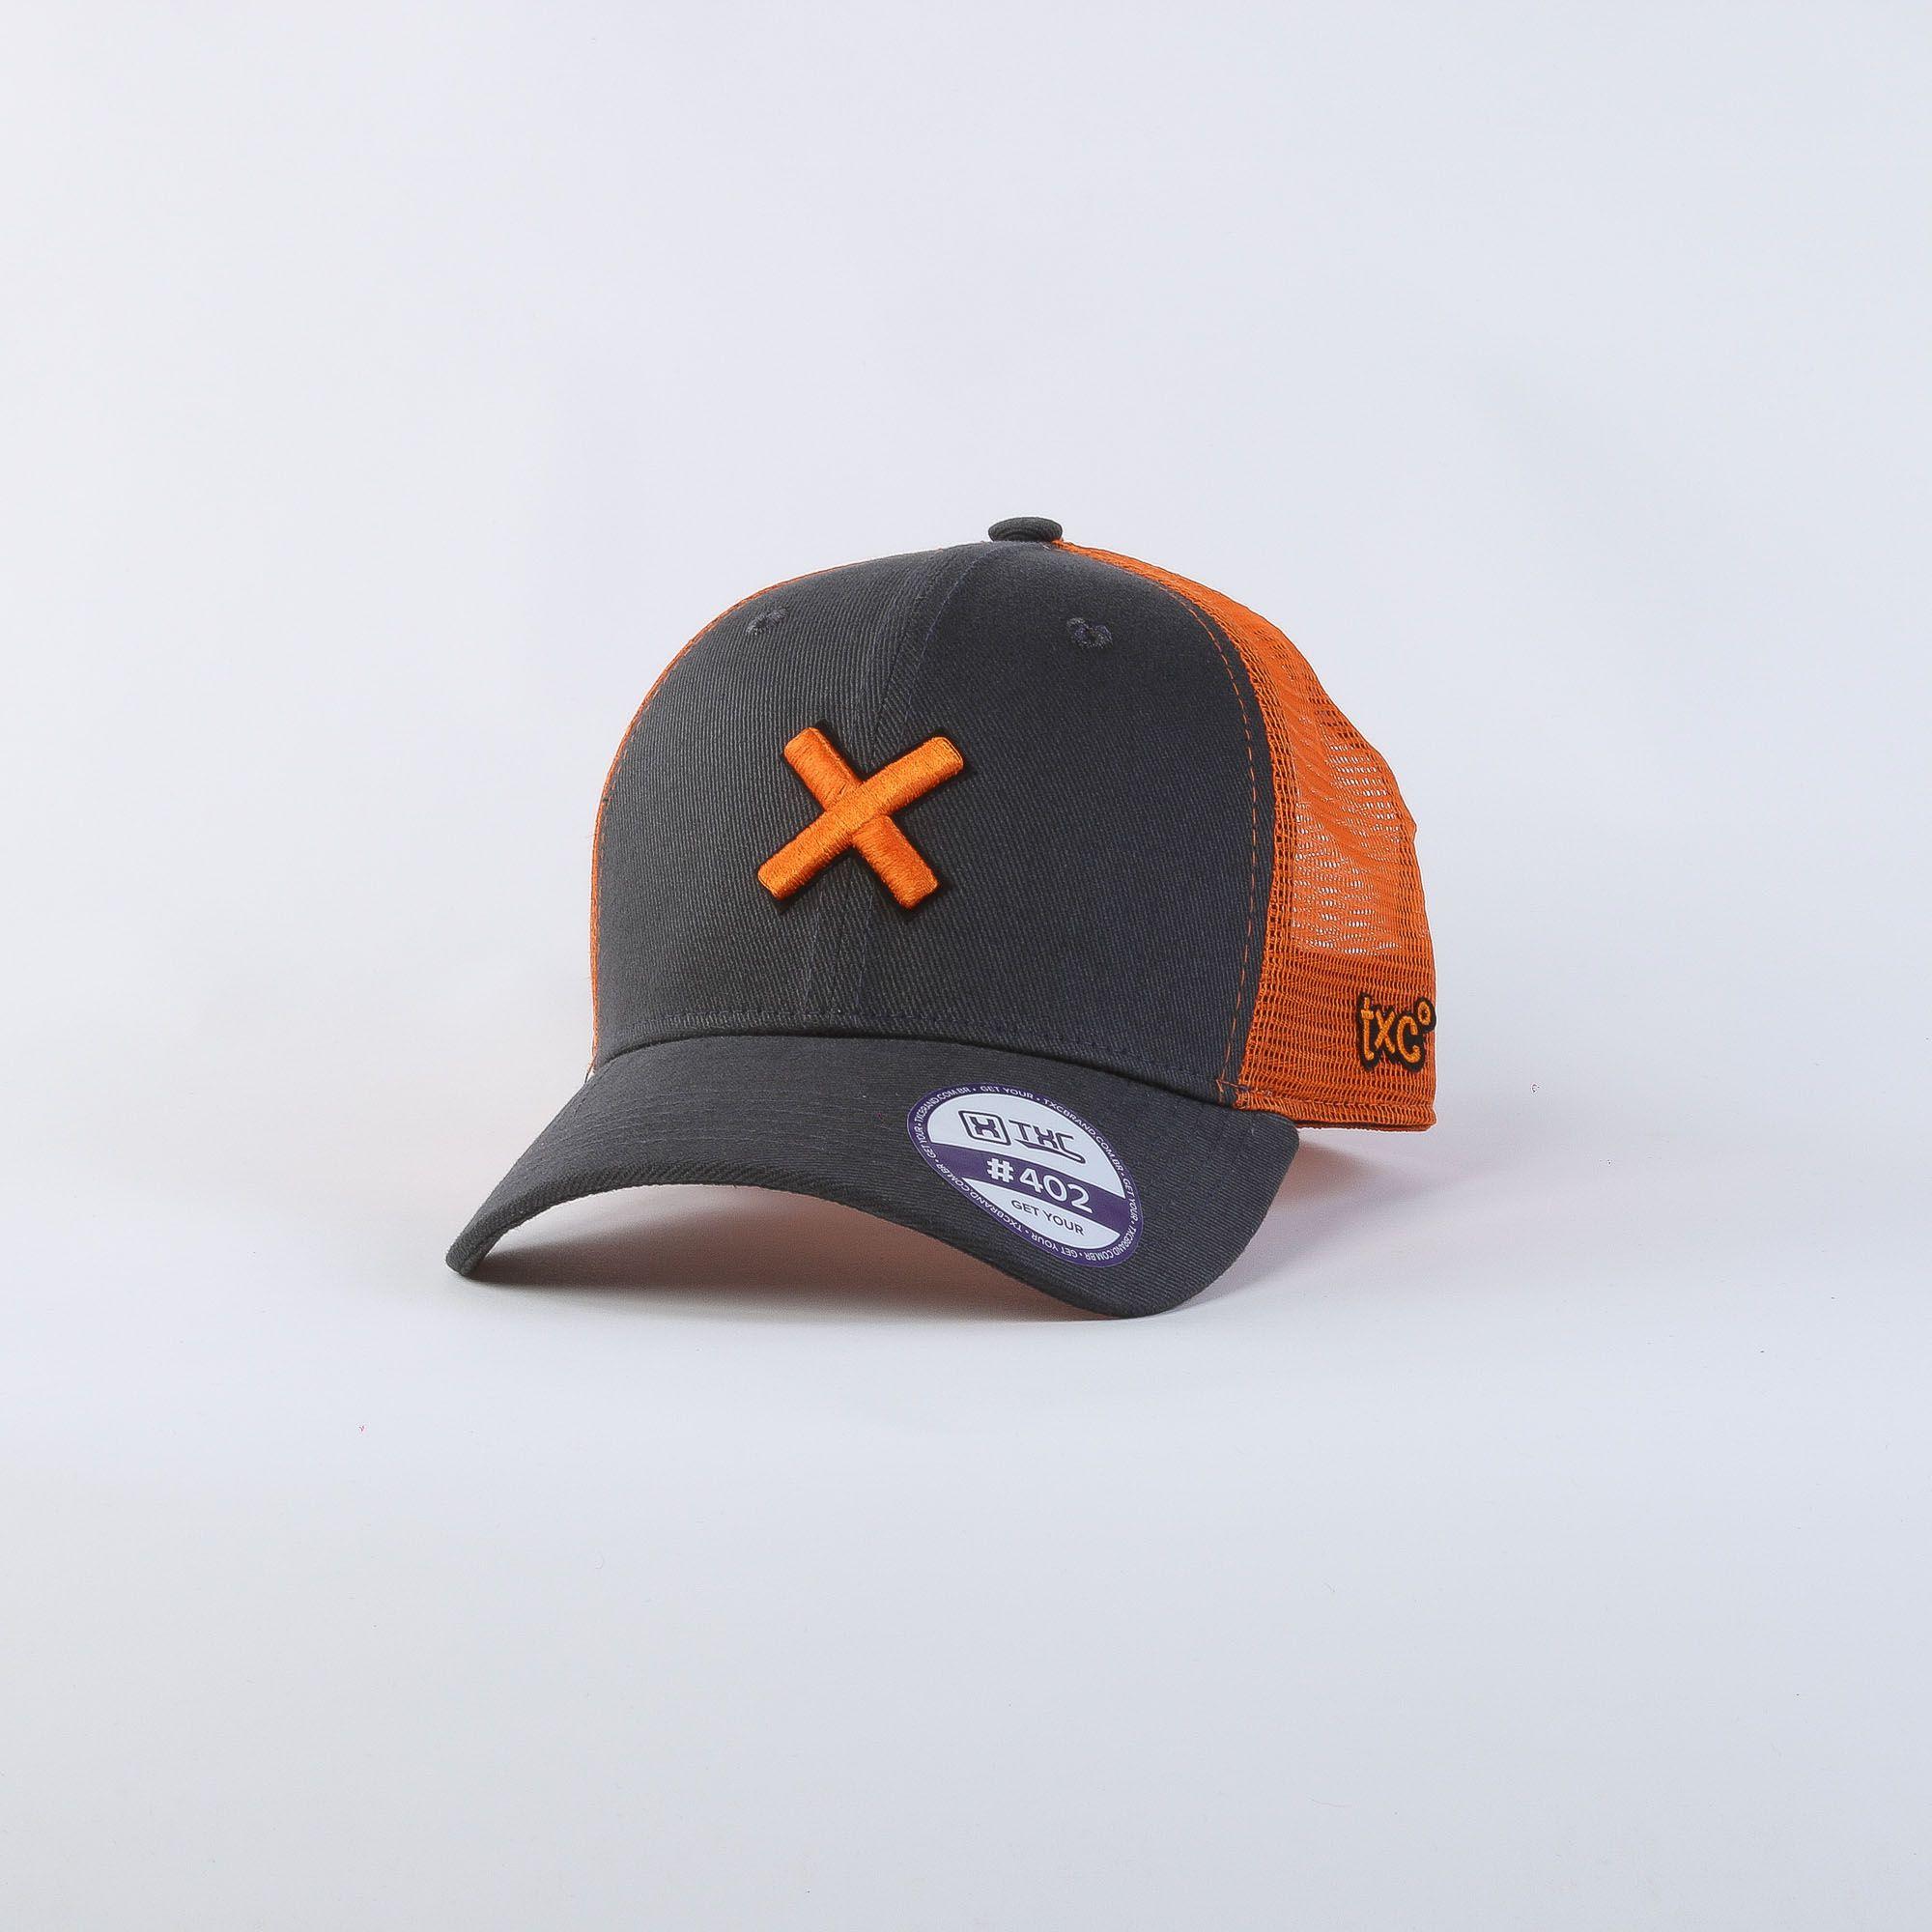 Boné TXC Brand aba curva 759C